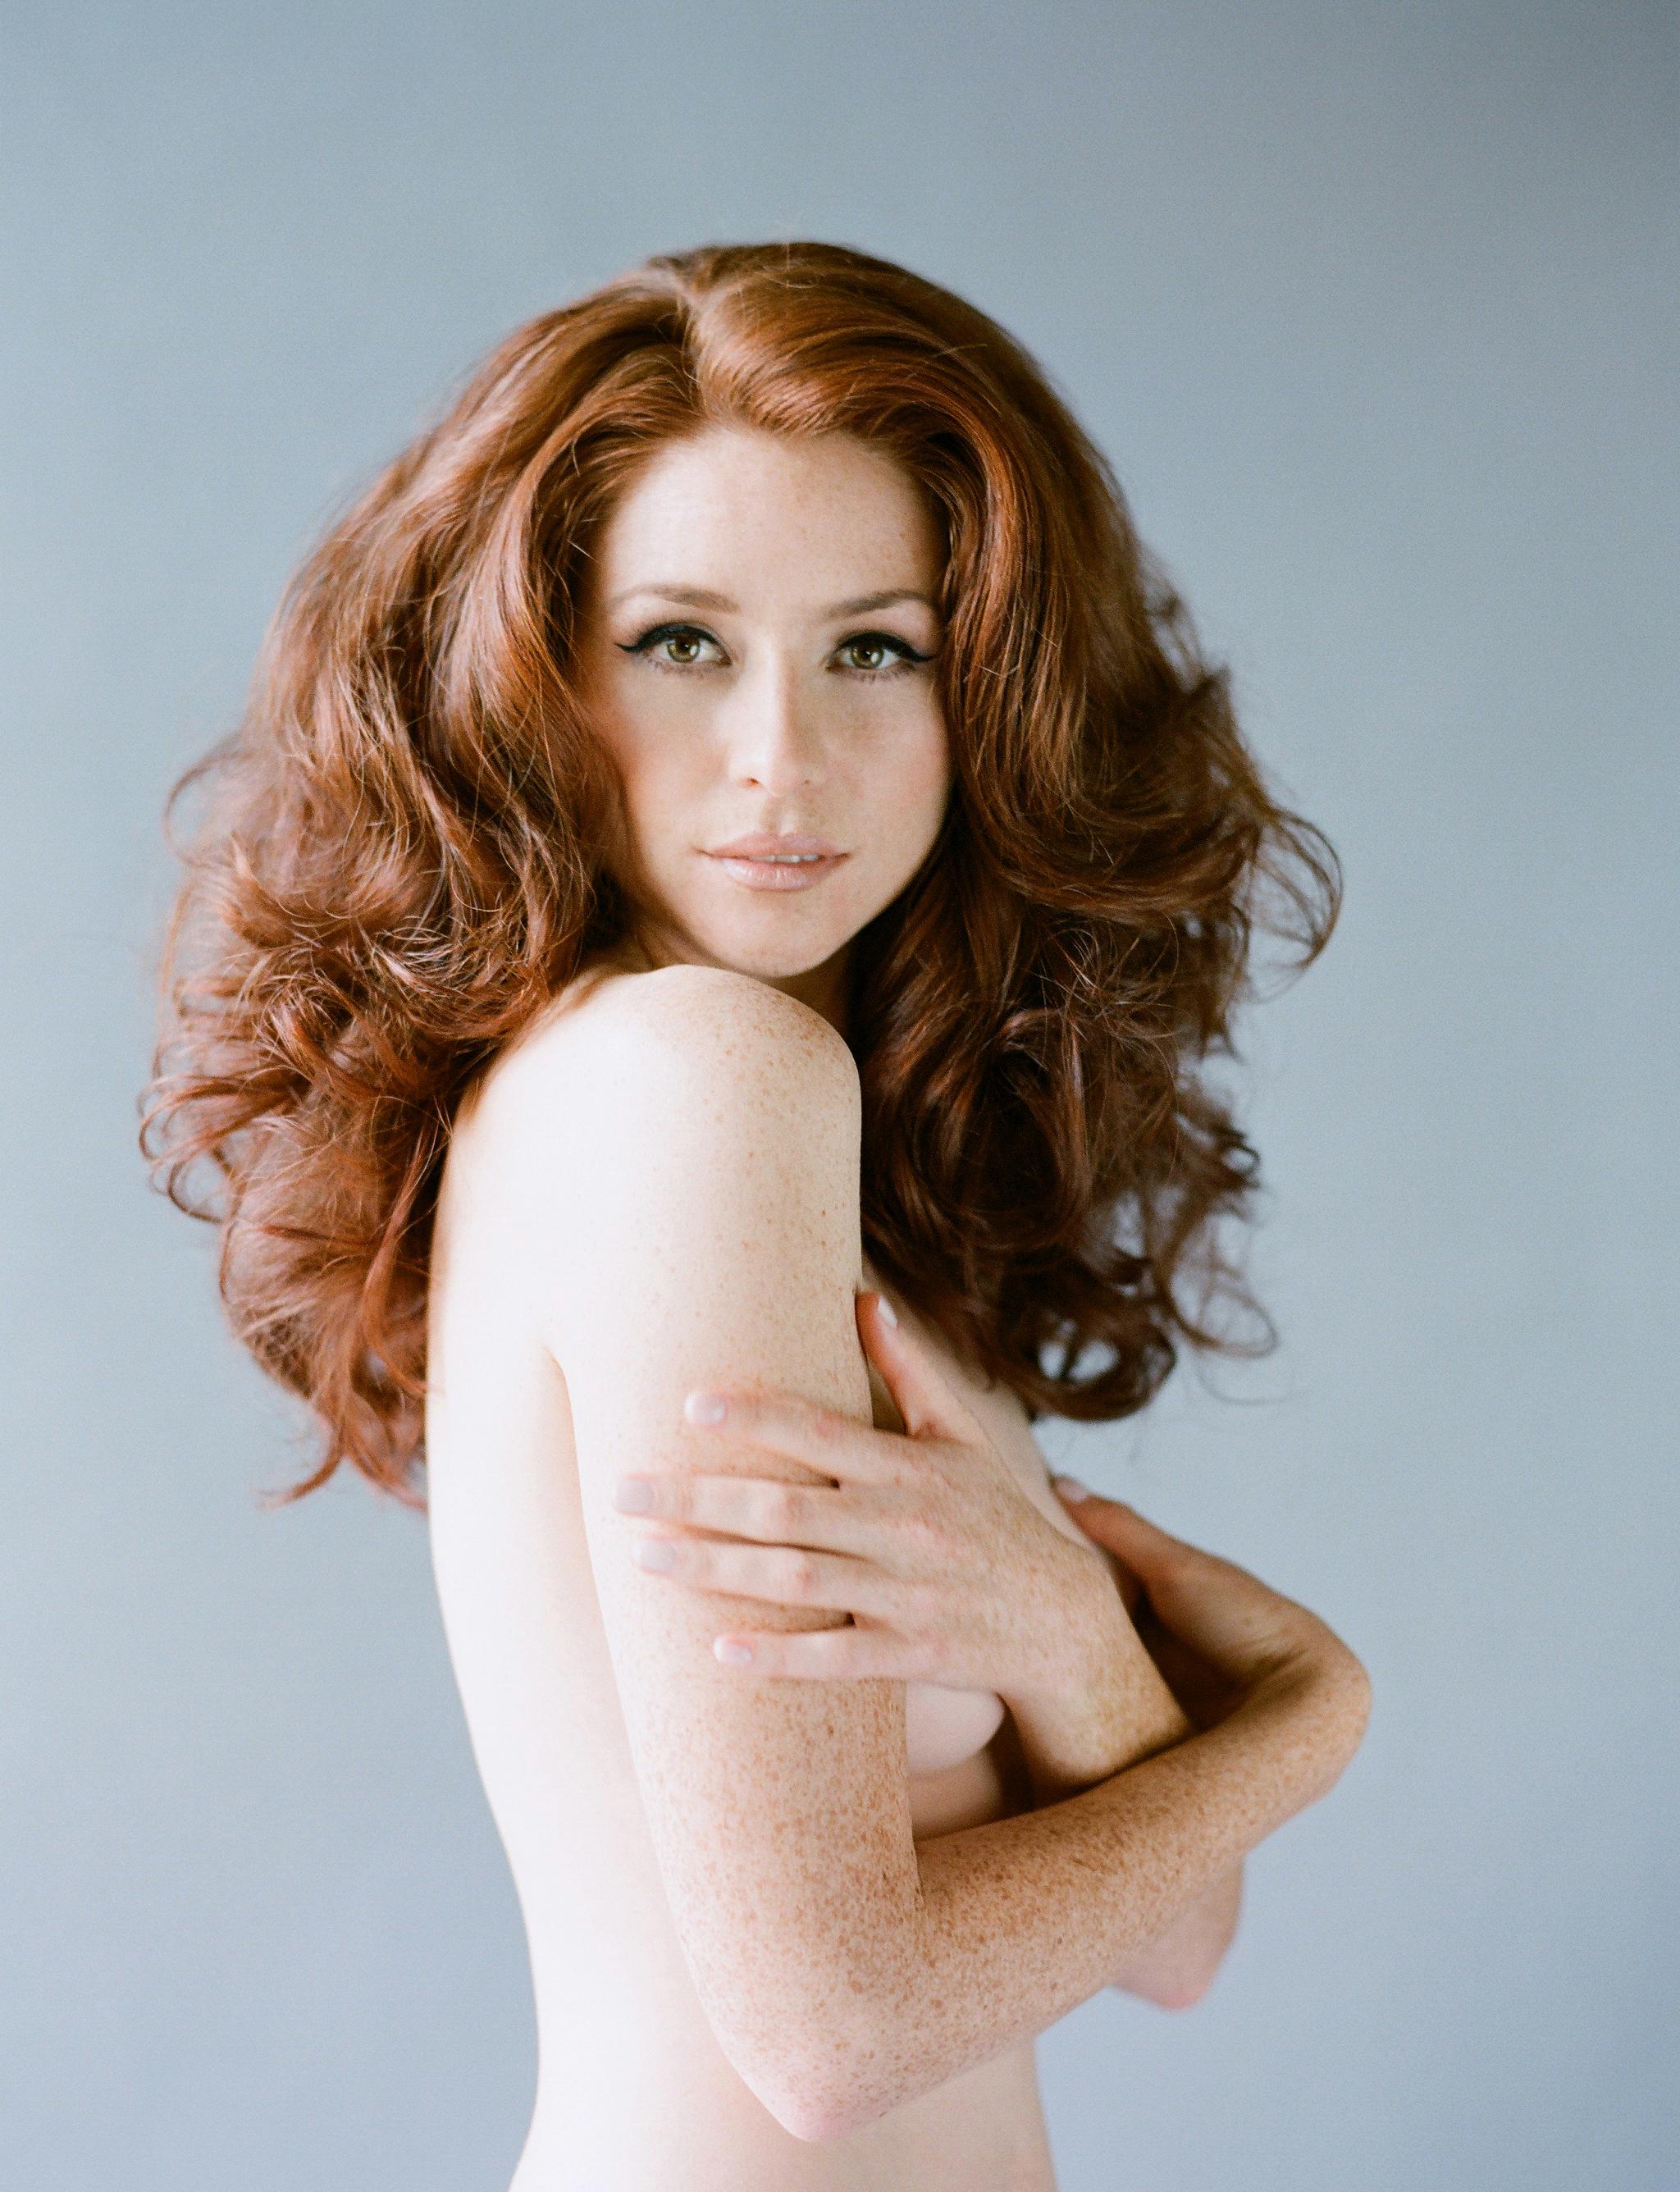 Doing Your Own Wedding Hair : Diy Bridal Hair How To Do Your Own Wedding Hair Real ...